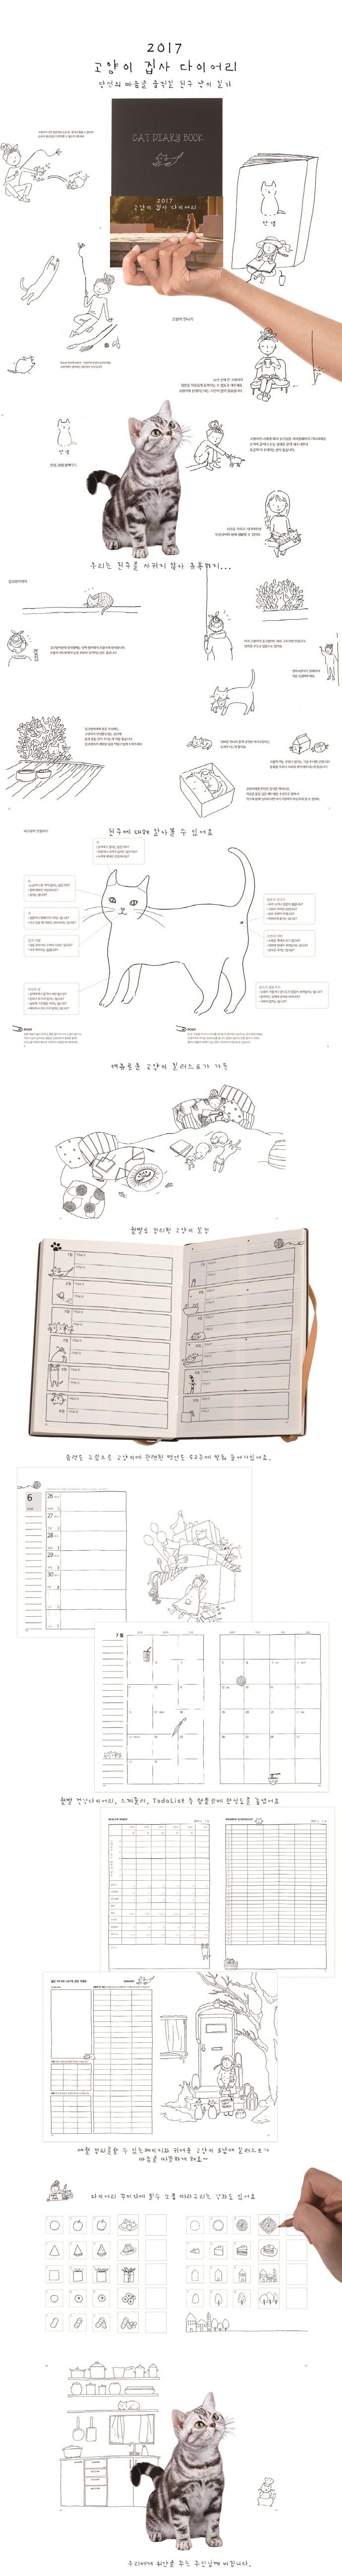 Cat Diary Book(고양이 집사 다이어리)(2017)(양장본 HardCover) 도서 상세이미지